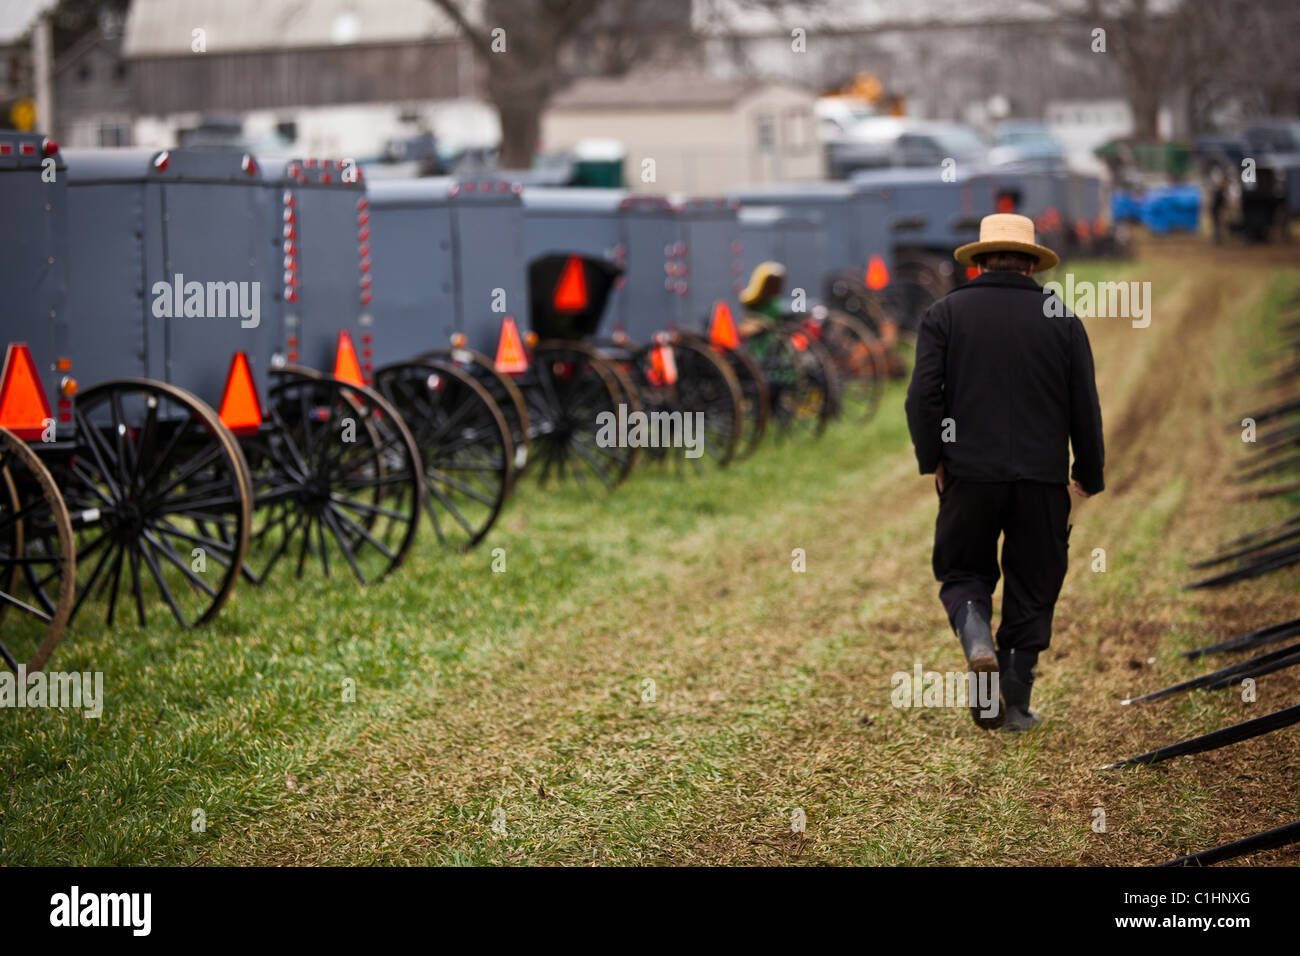 Amish Pennsylvania Stock Photos & Amish Pennsylvania Stock